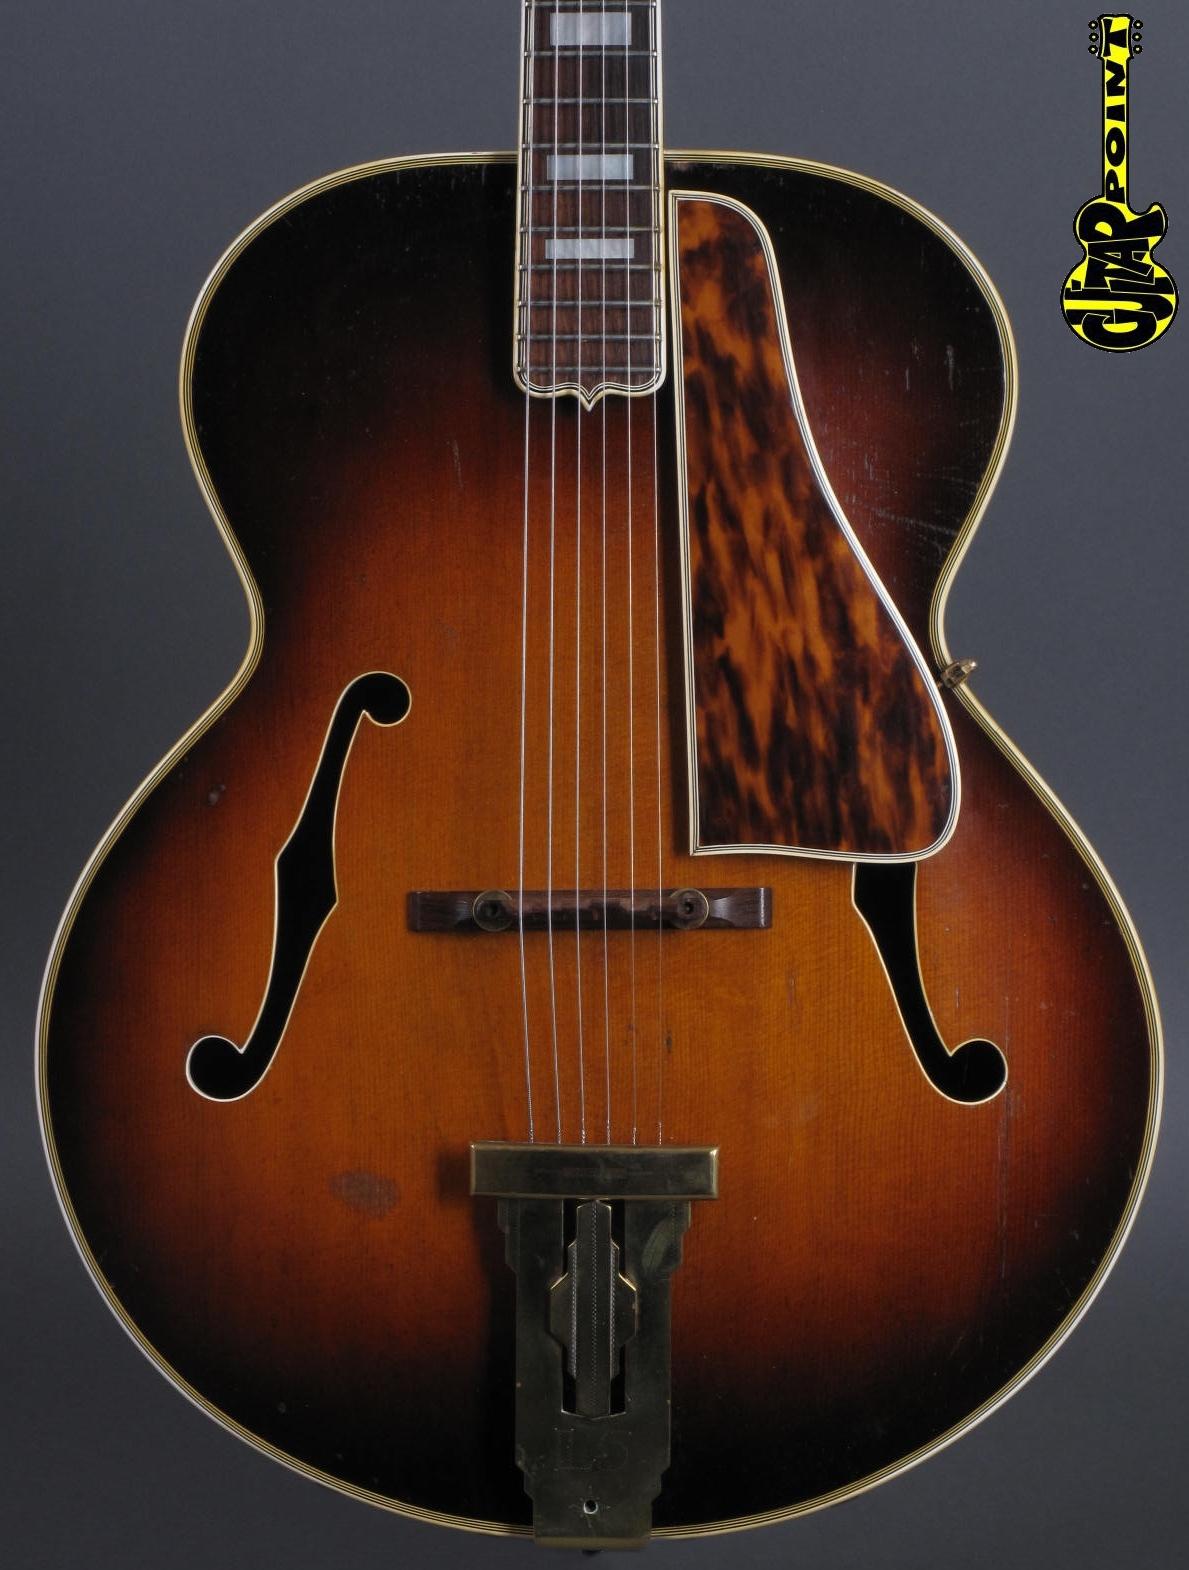 1948 Gibson L-5 - Sunburst